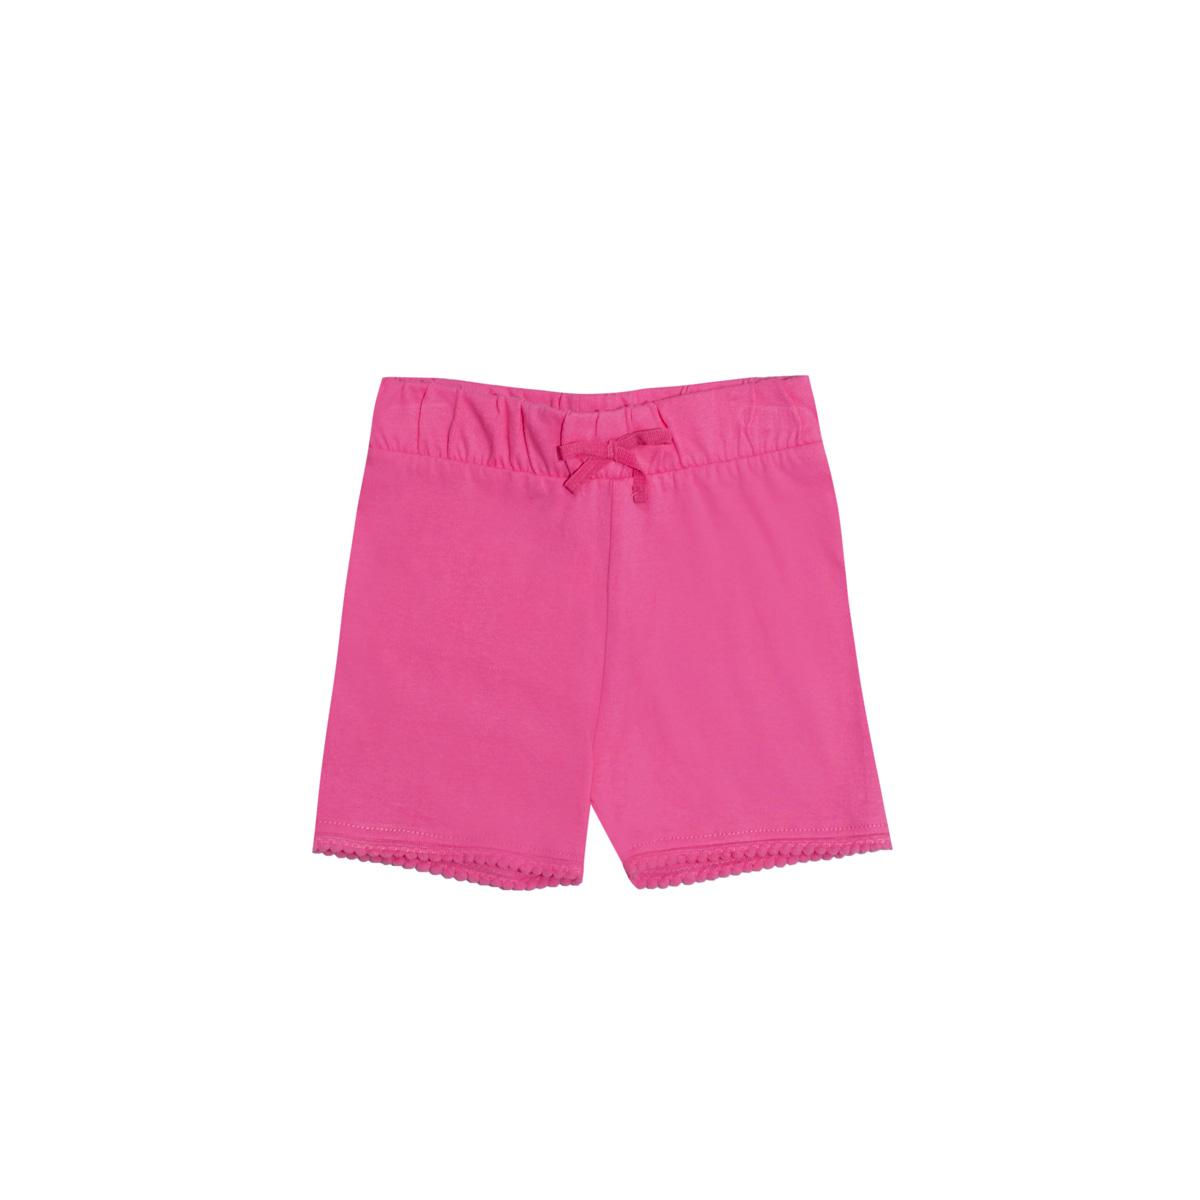 Baby hlače, roza